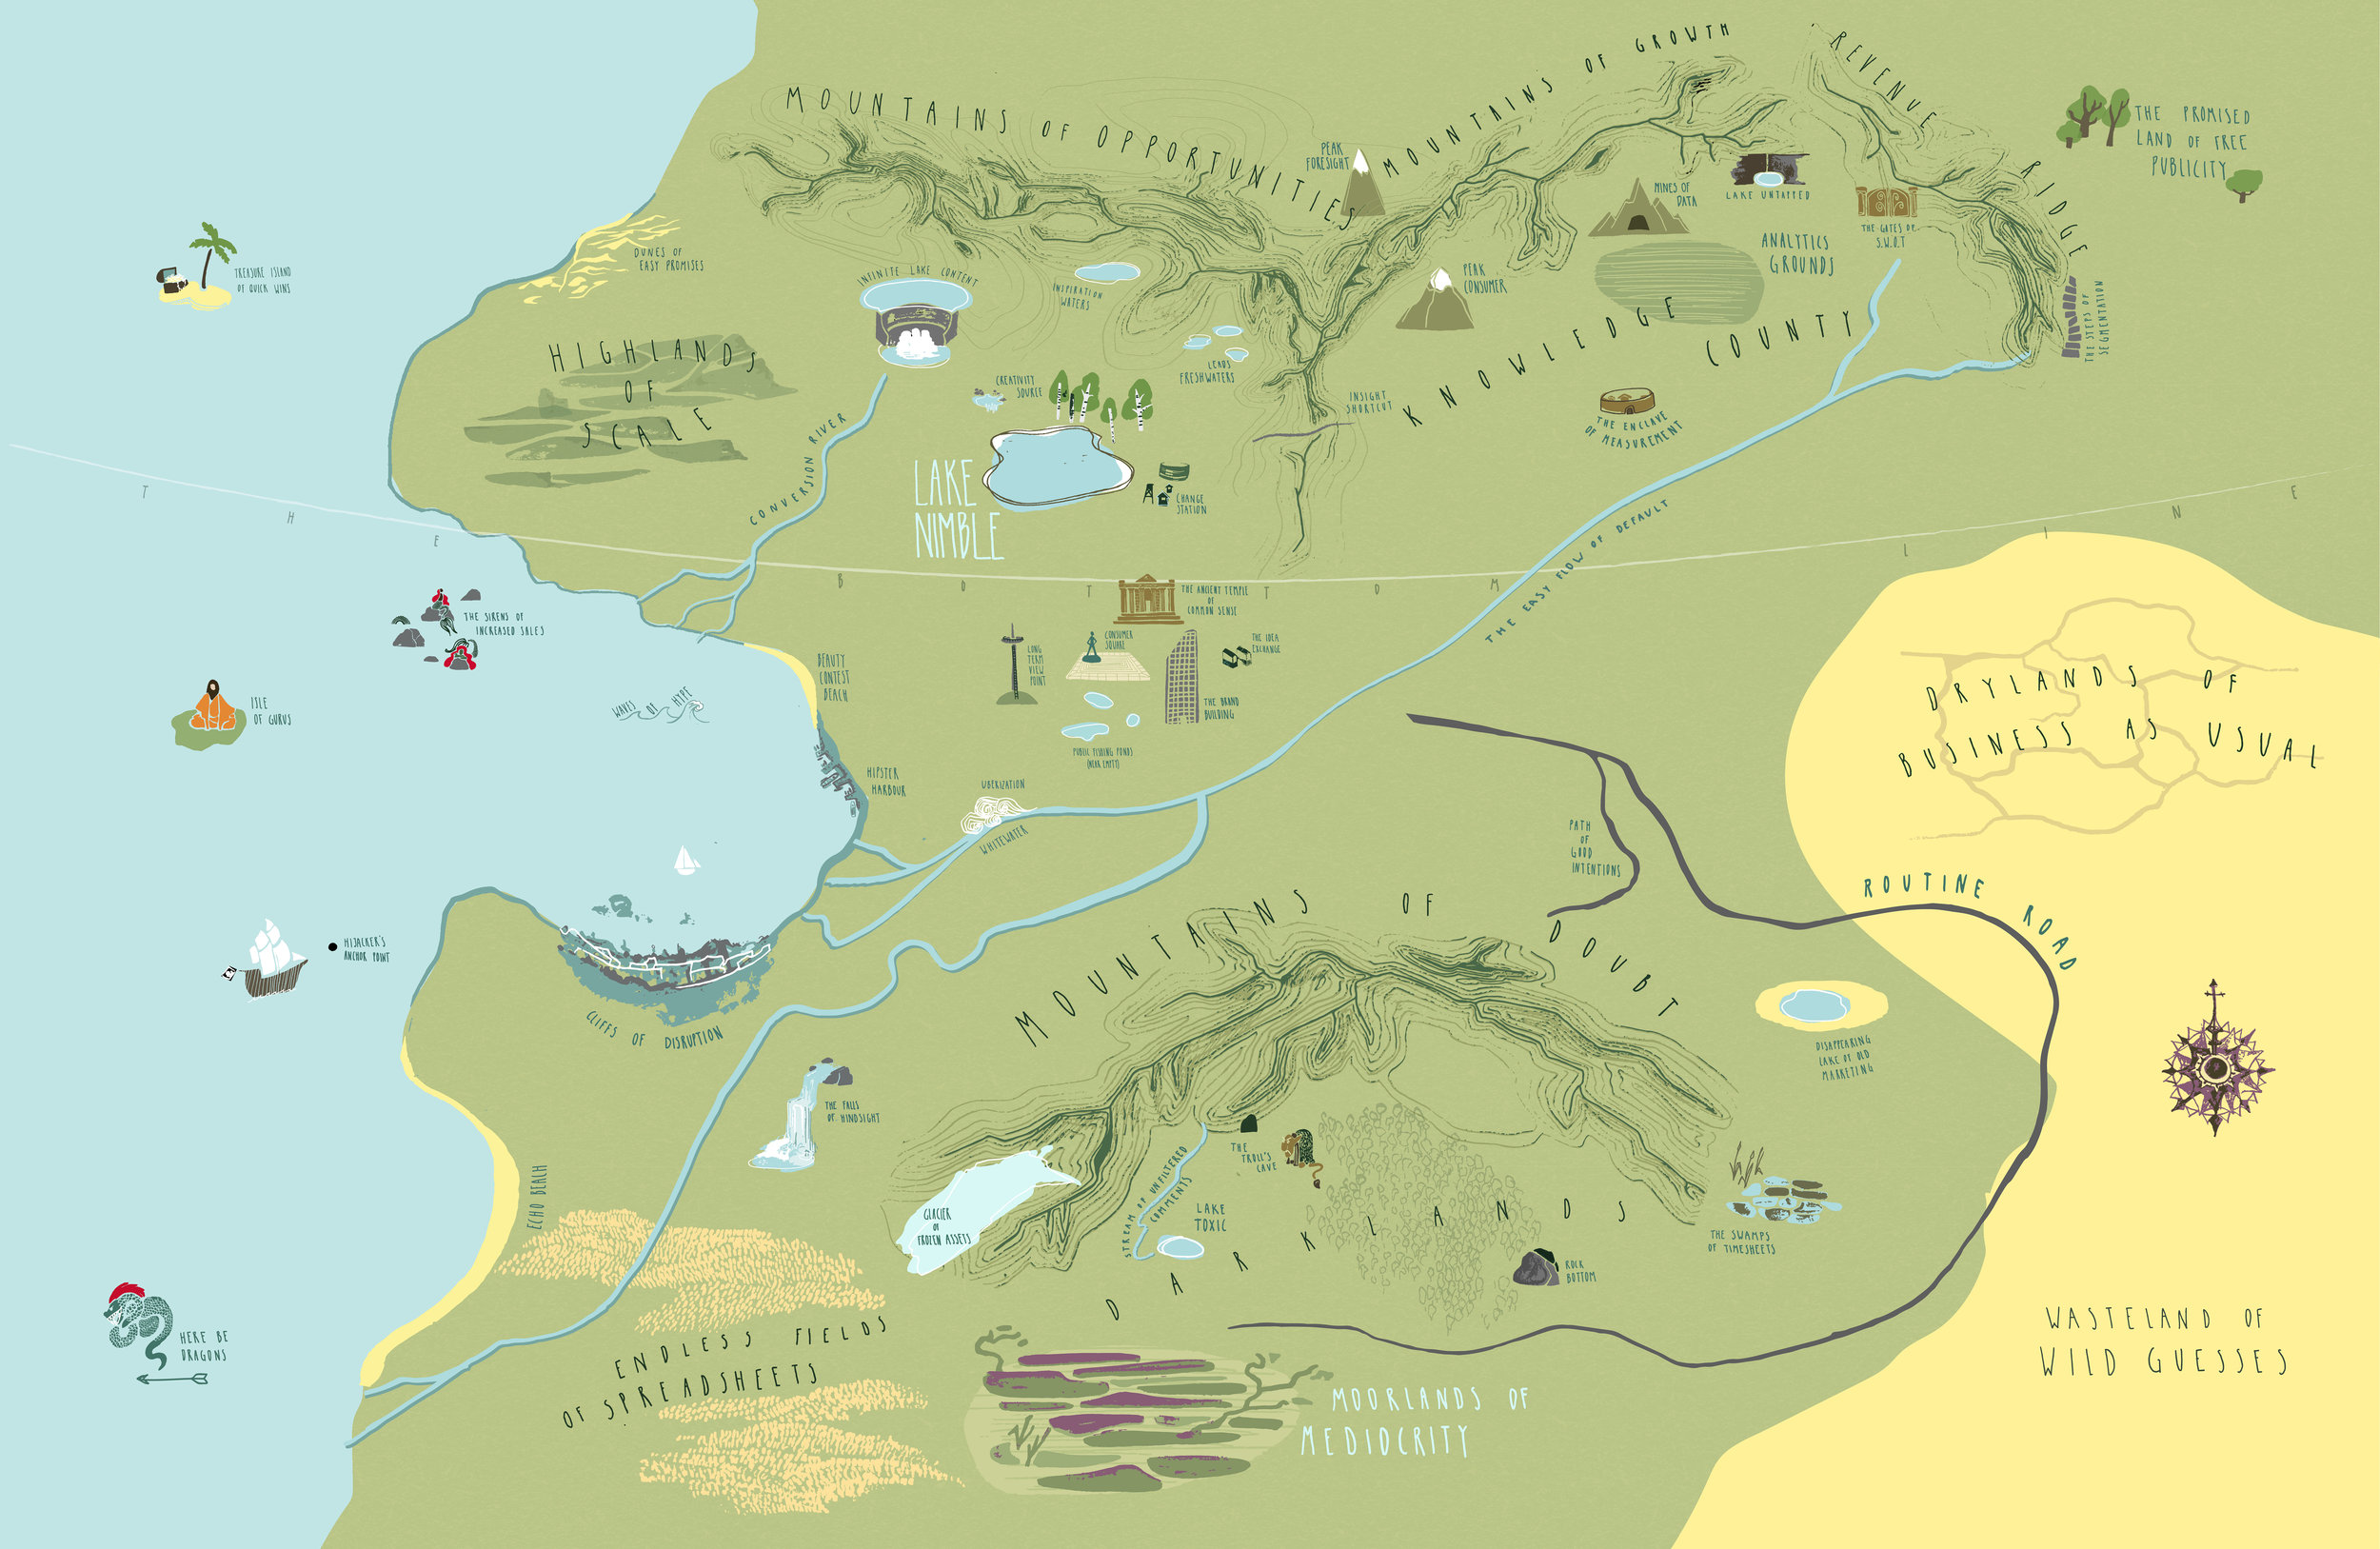 Toby Curden Illustration_Lake Nimble_300dpi.jpg